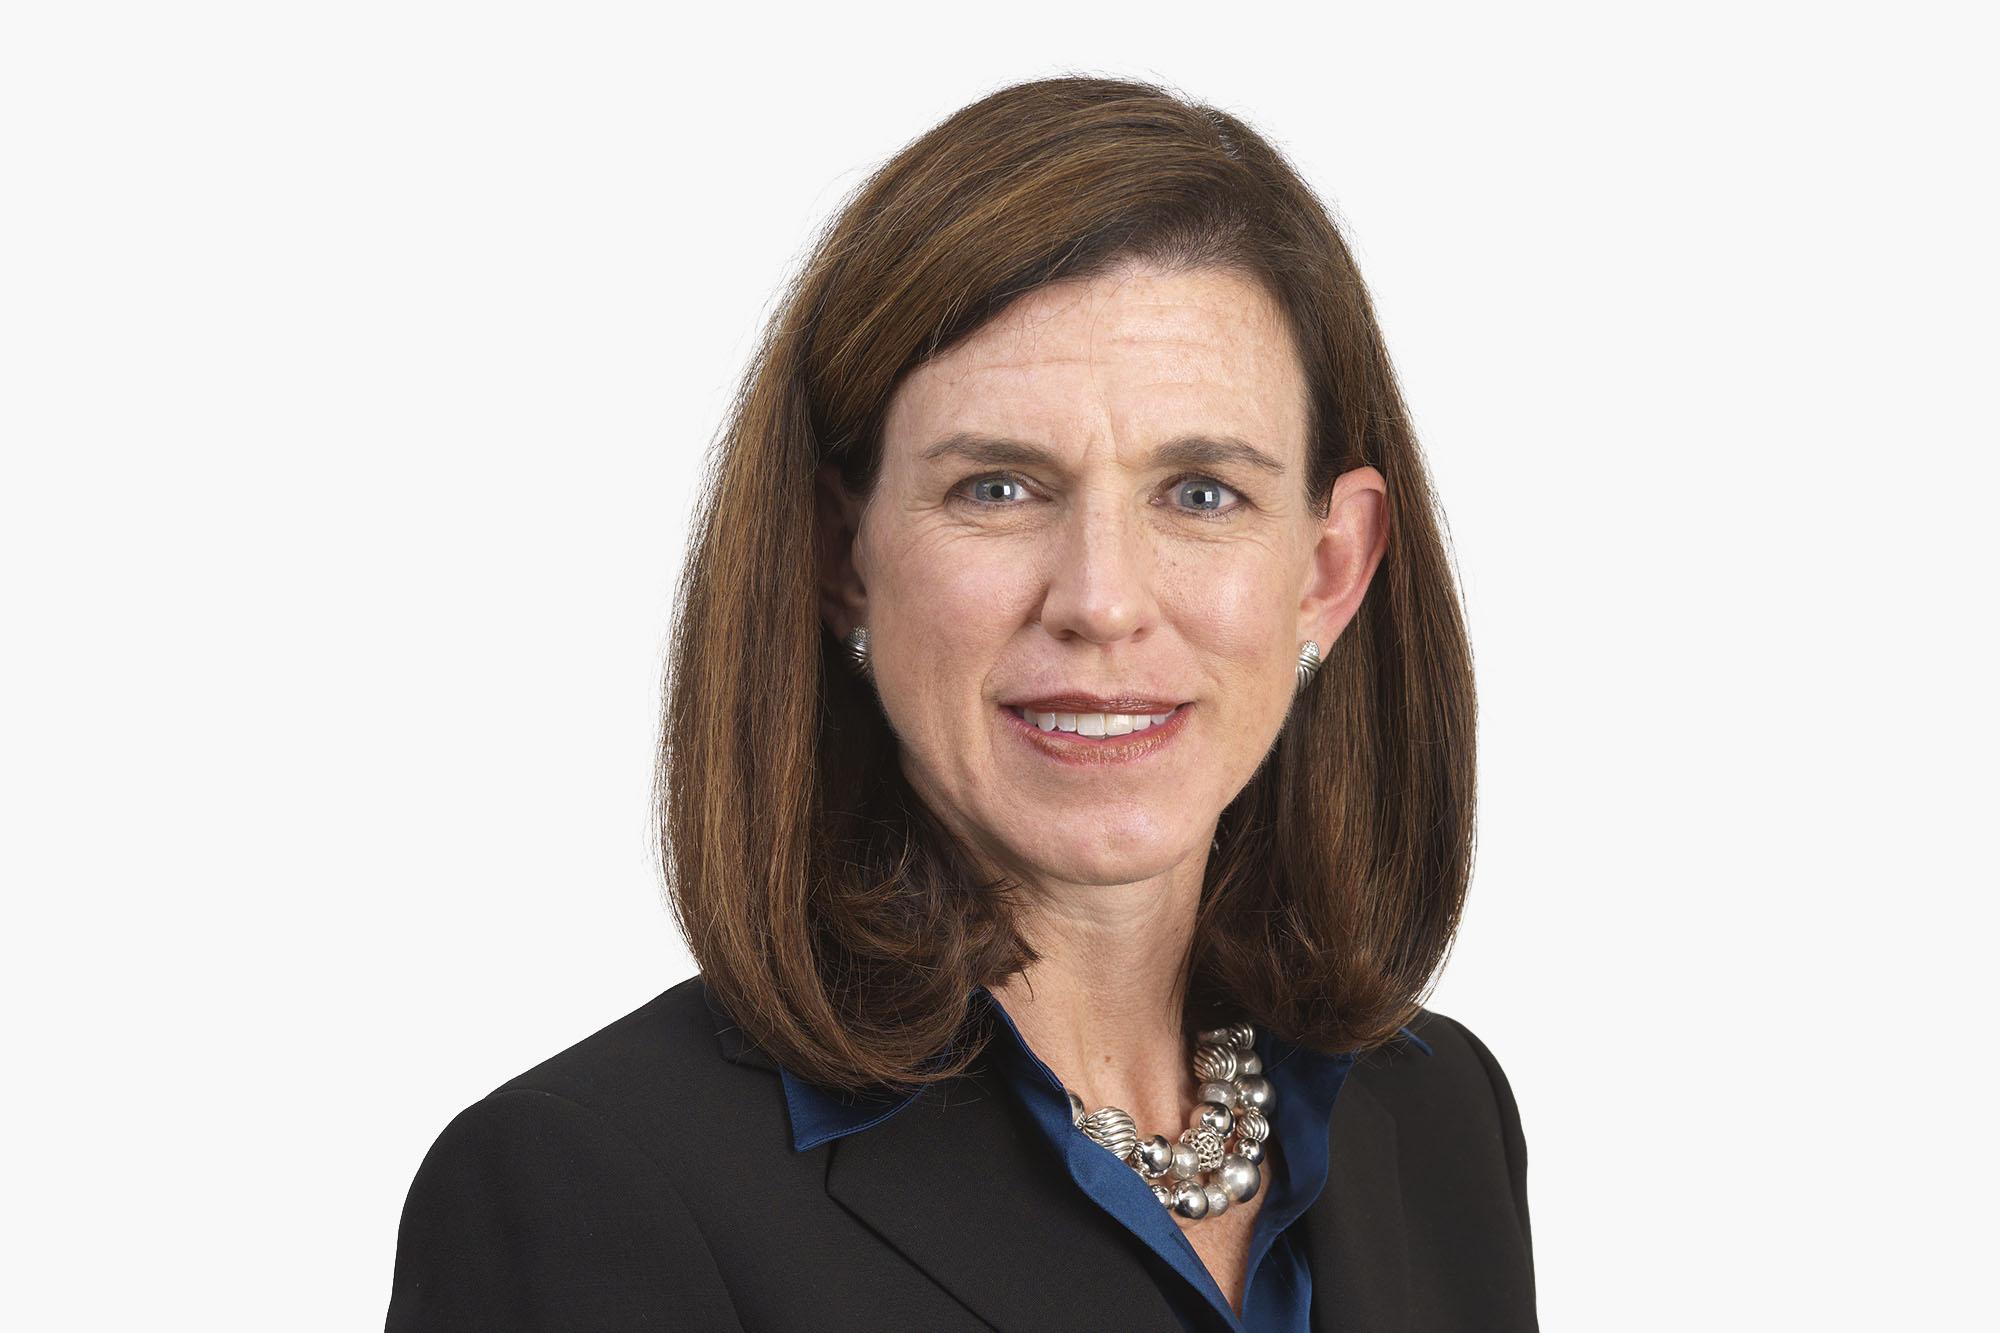 Low Interest Rates King Midas Golden Touch Speech By Kristin